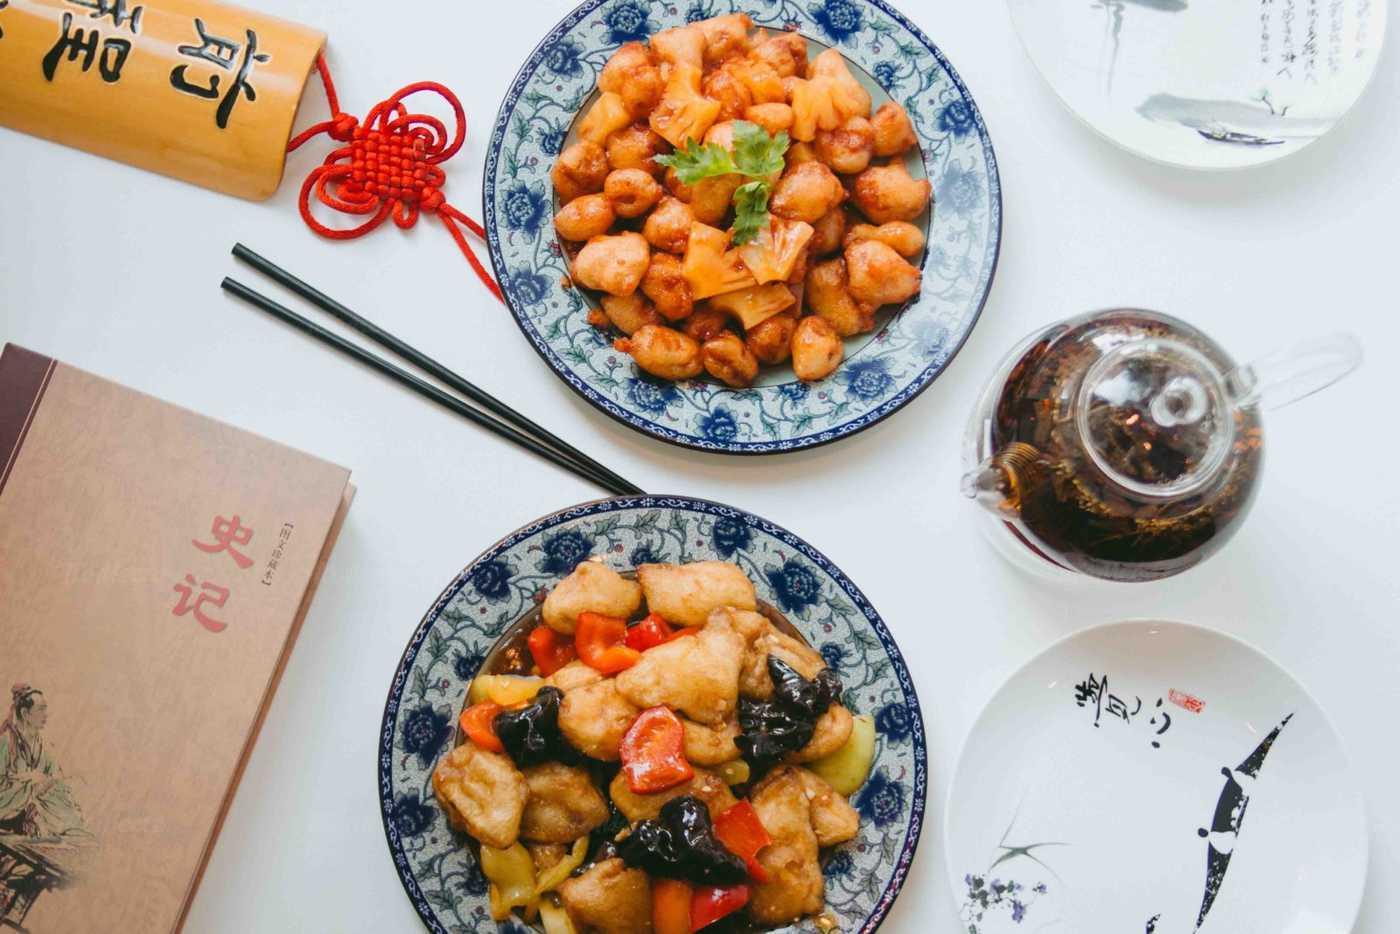 Меню ресторана Цзао Ван на Перекопской фото 45